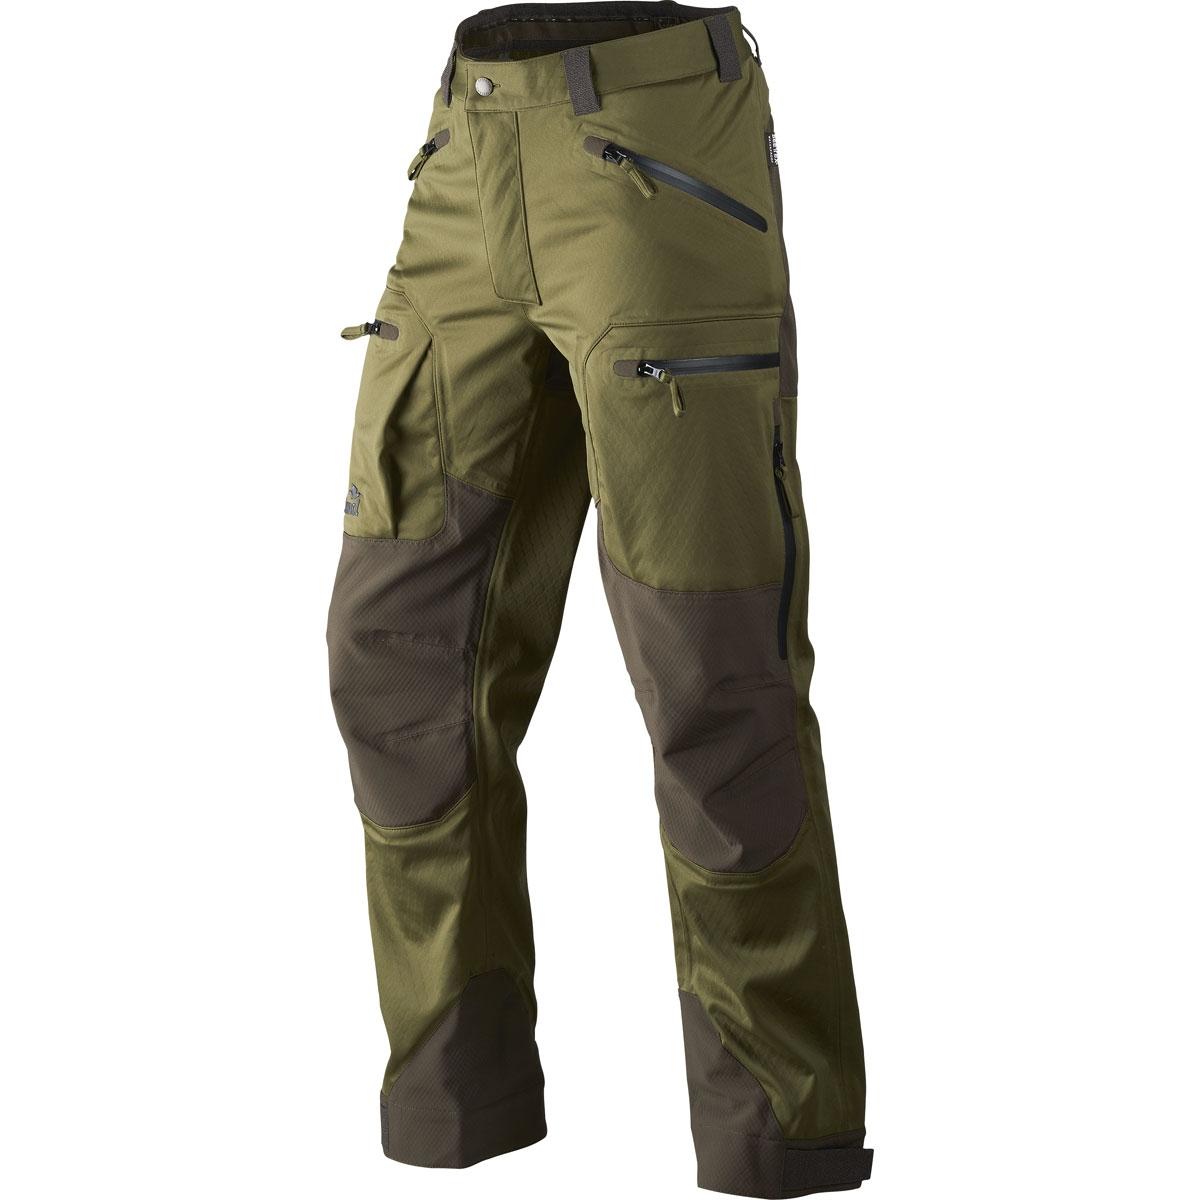 f2819c82eadfa Seeland Hawker Shell Trousers - Pro Green | Uttings.co.uk